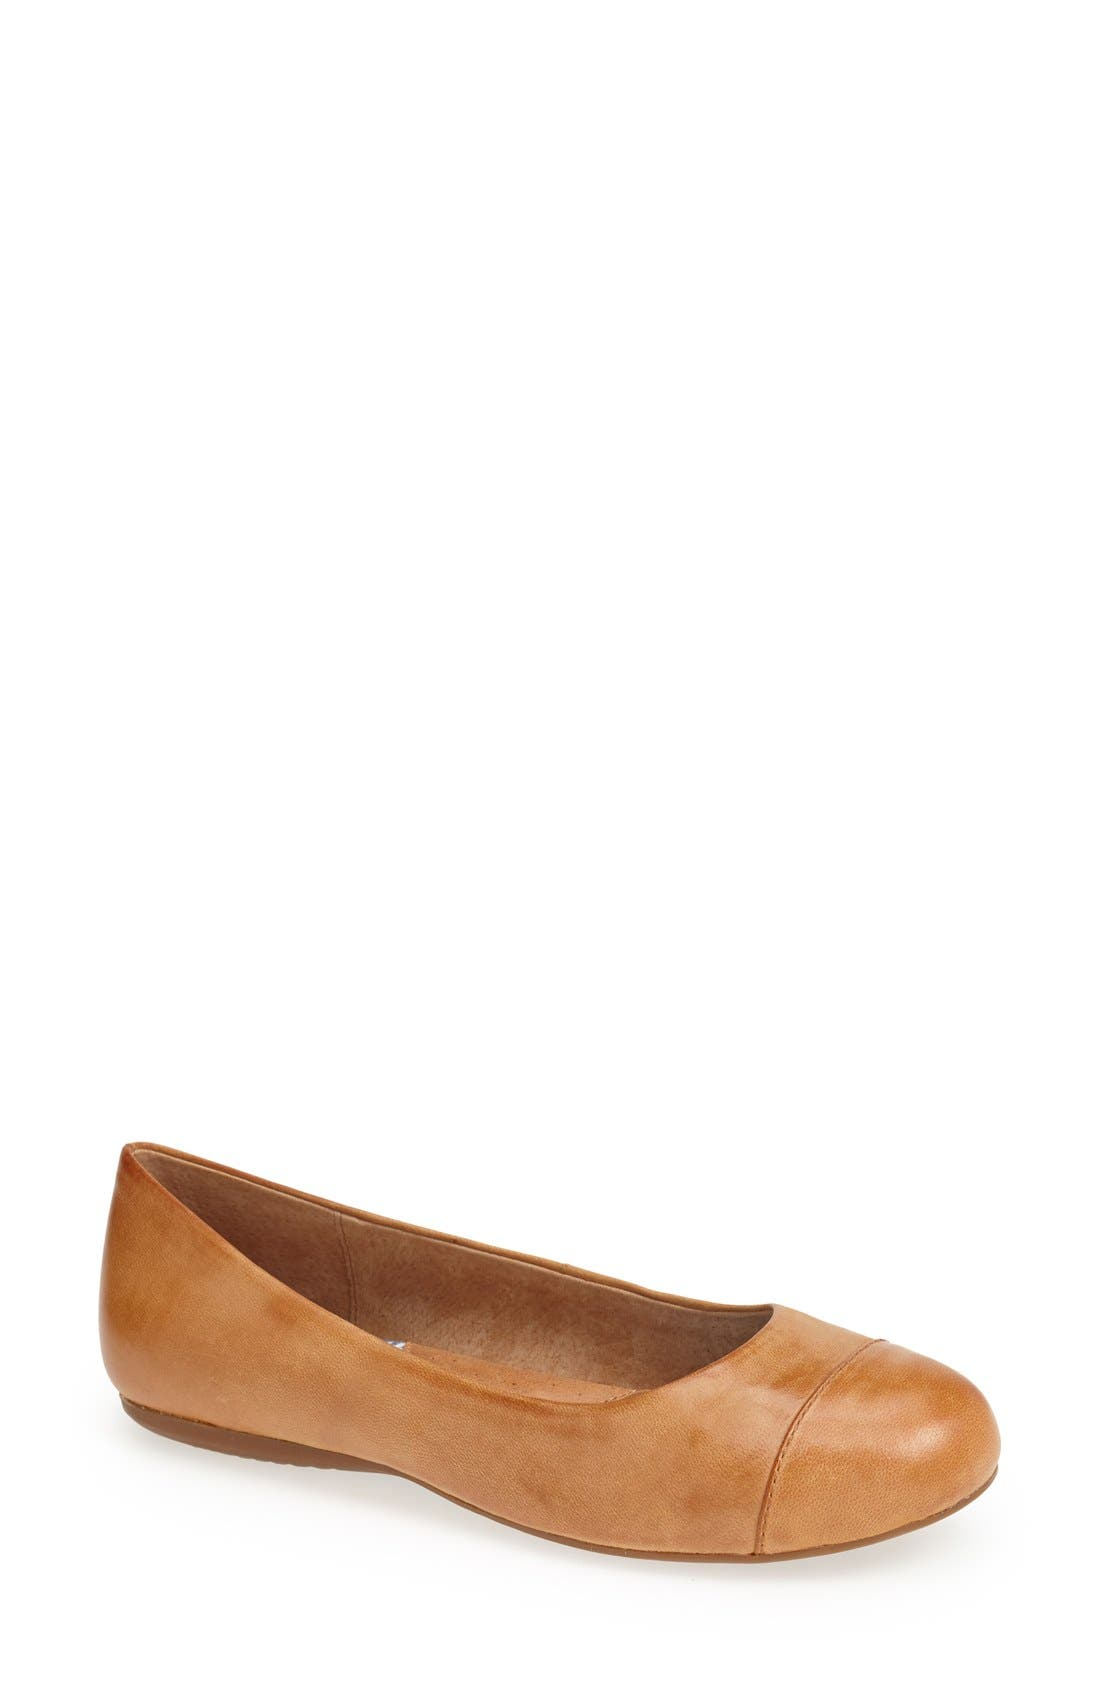 'Napa' Flat,                             Main thumbnail 1, color,                             Tan Leather